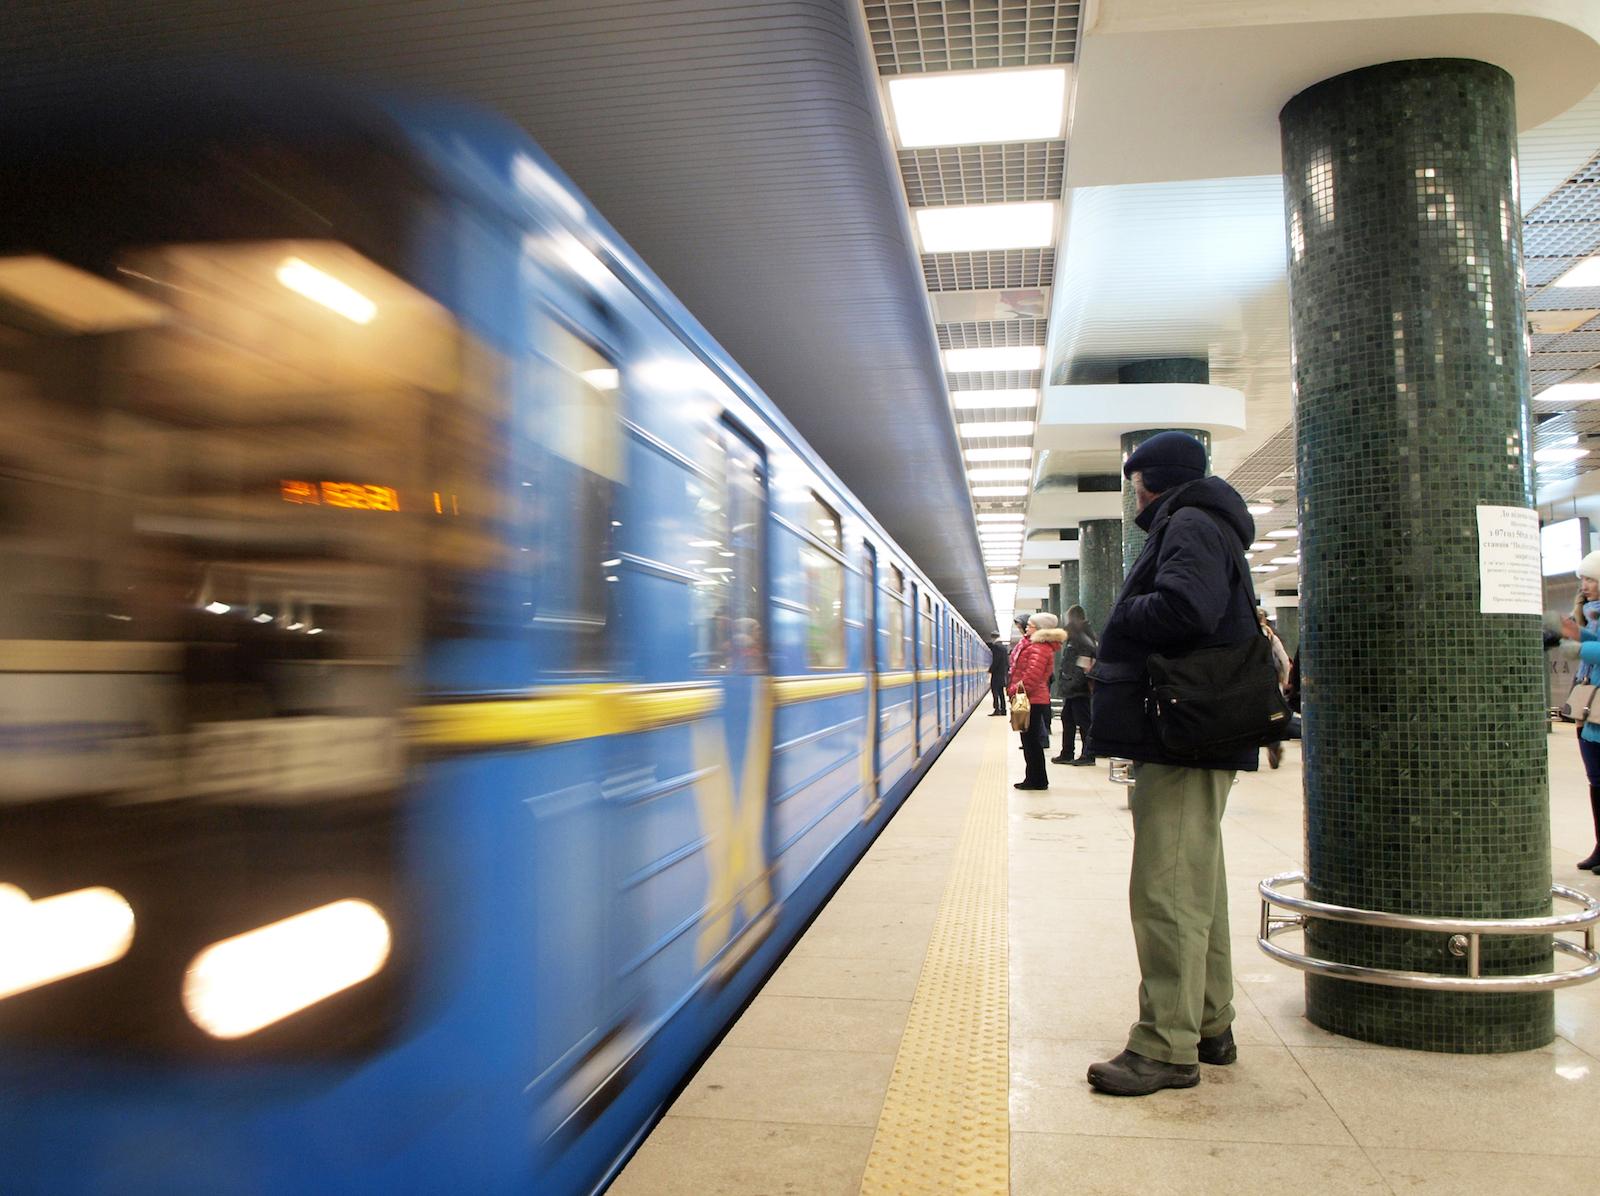 Vid 1 grudnja piľgy v metro Kyjeva — vyključno z «Kartkoju kyjanyna»